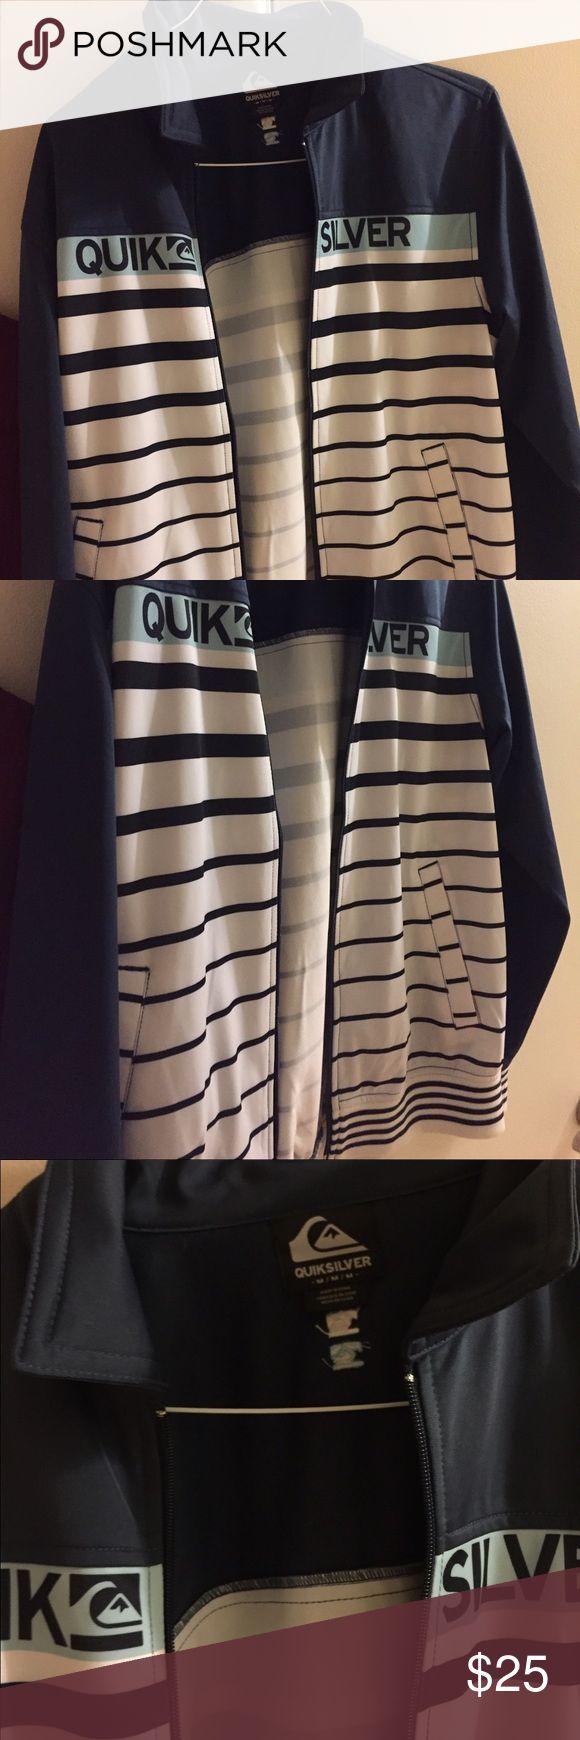 Quiksilver zip up Quiksilver medium striped zip up - perfect condition Quiksilver Jackets & Coats Lightweight & Shirt Jackets